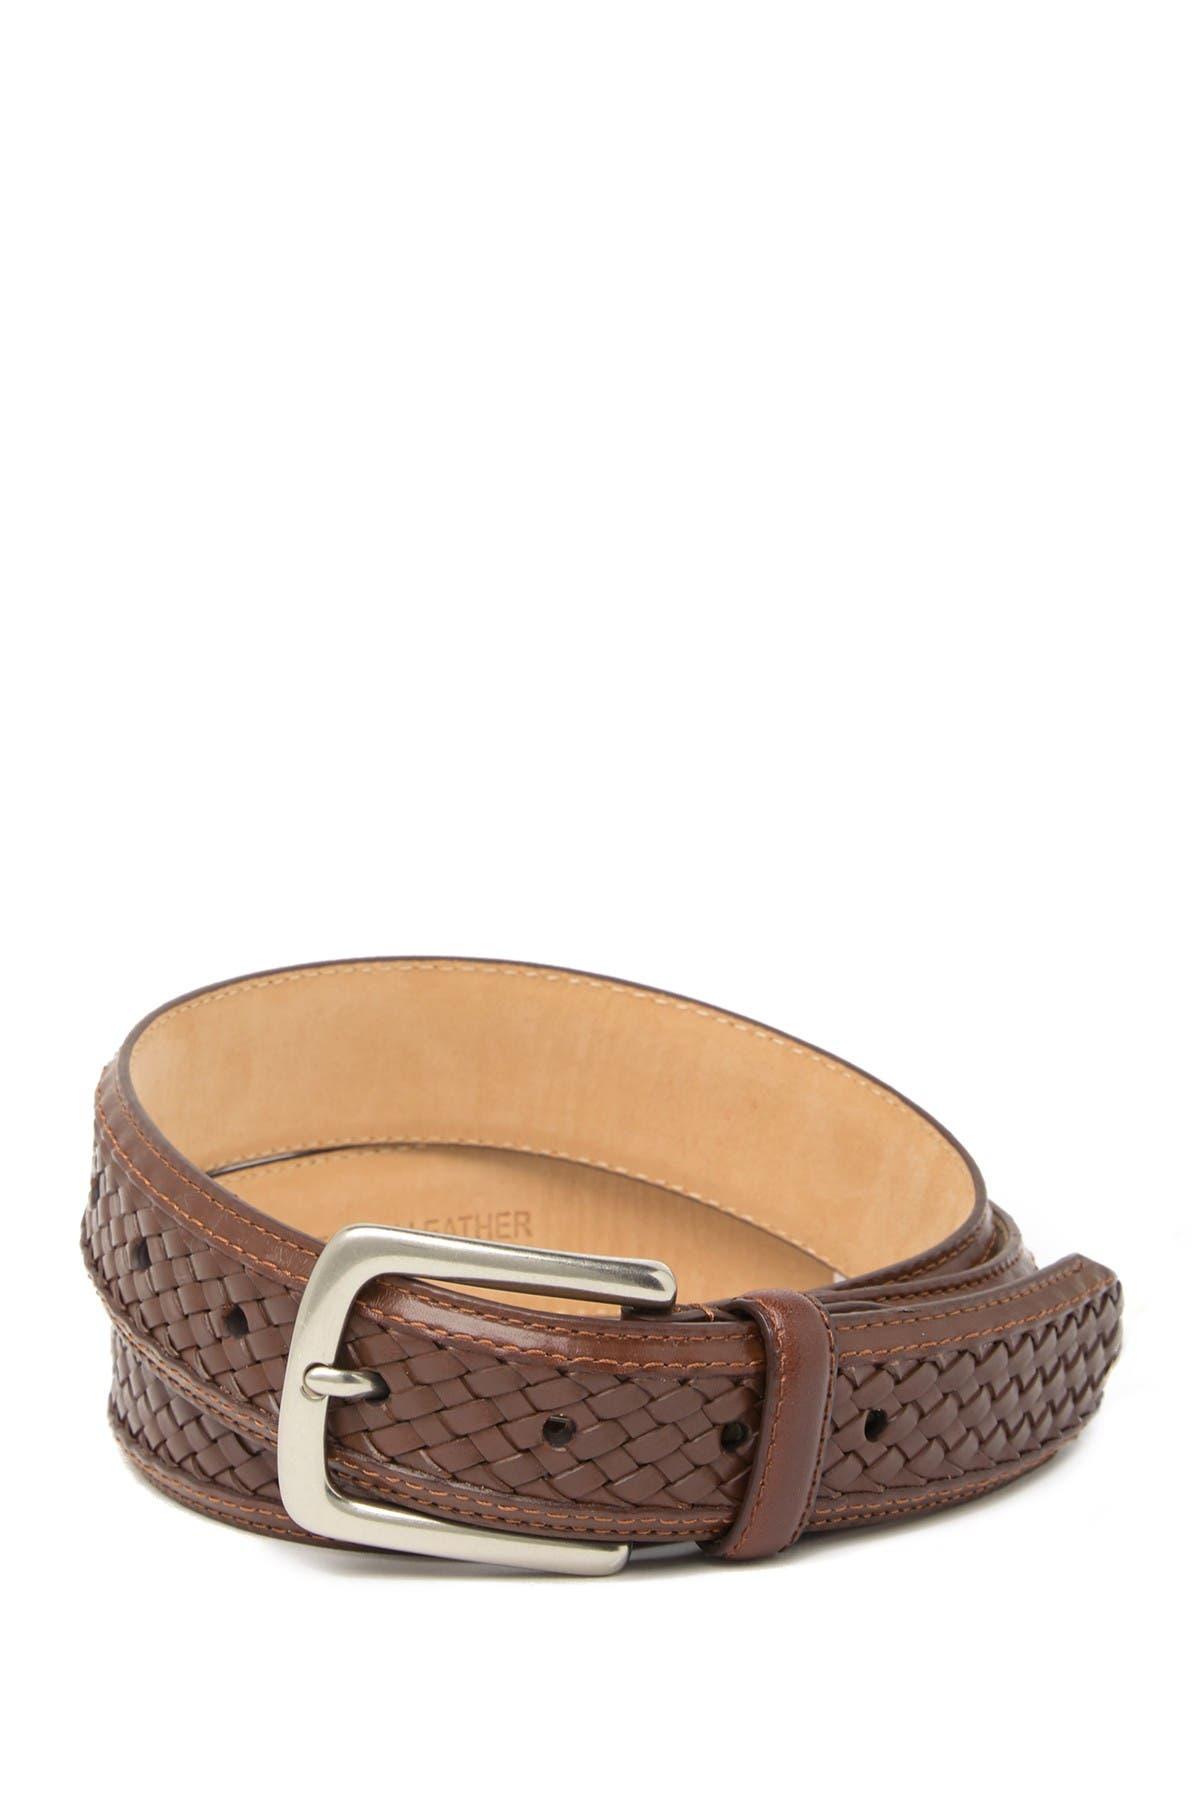 Image of Tommy Bahama Woven Braided Belt